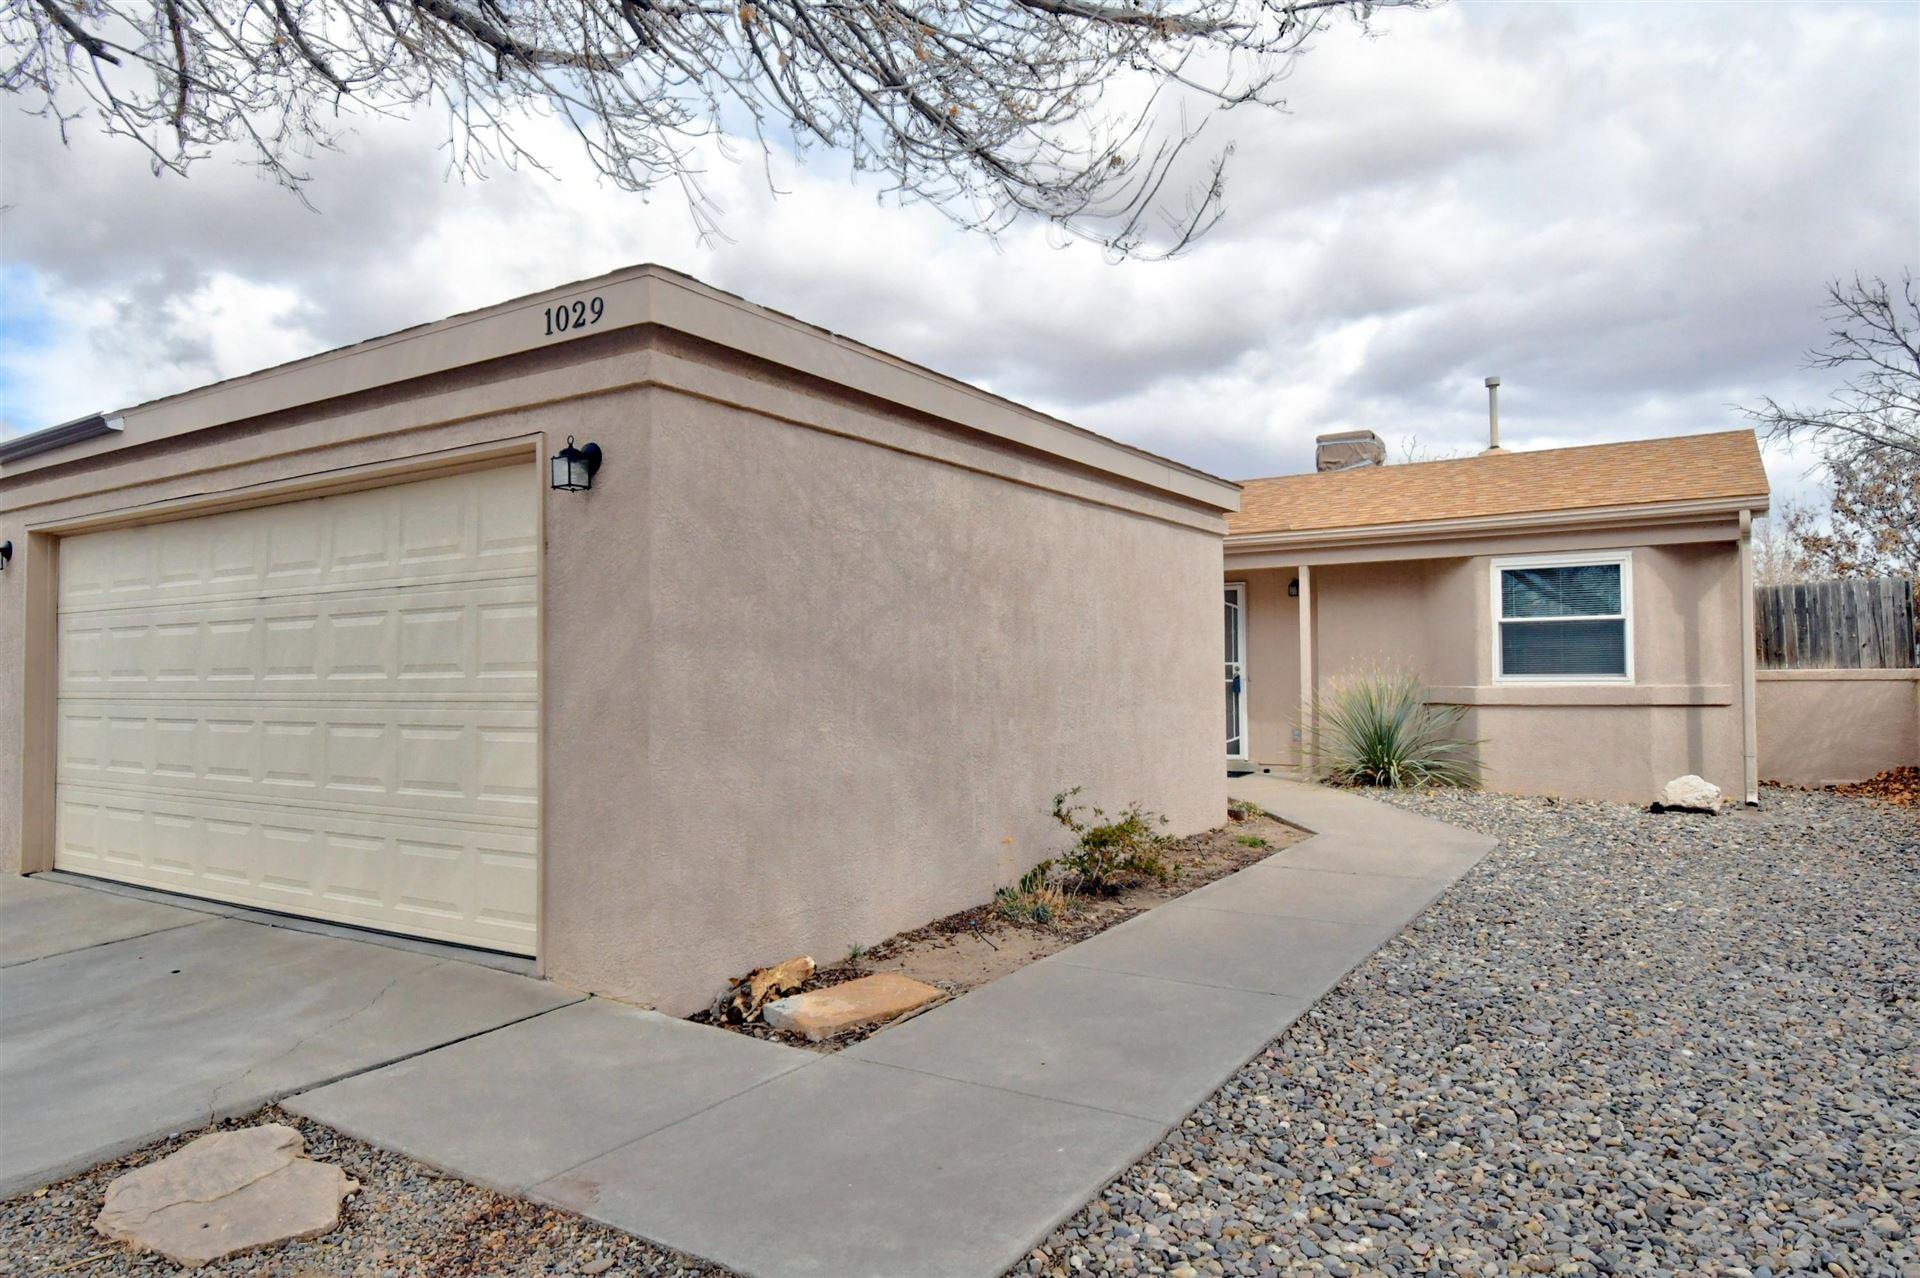 1029 HARRISON Drive NE, Rio Rancho, NM 87144 - MLS#: 987822